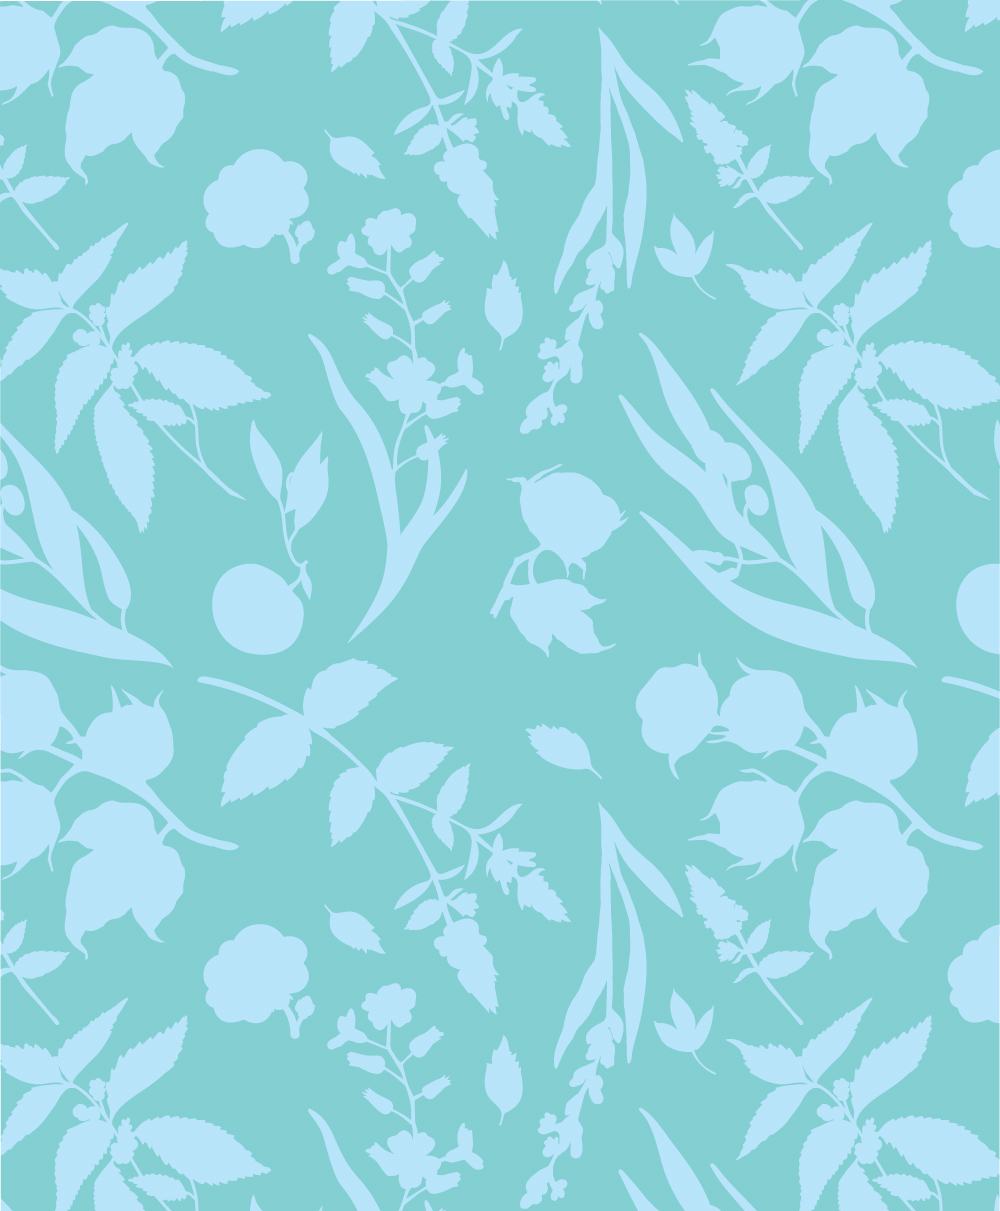 justbenice-BioMio-pattern-2.jpg